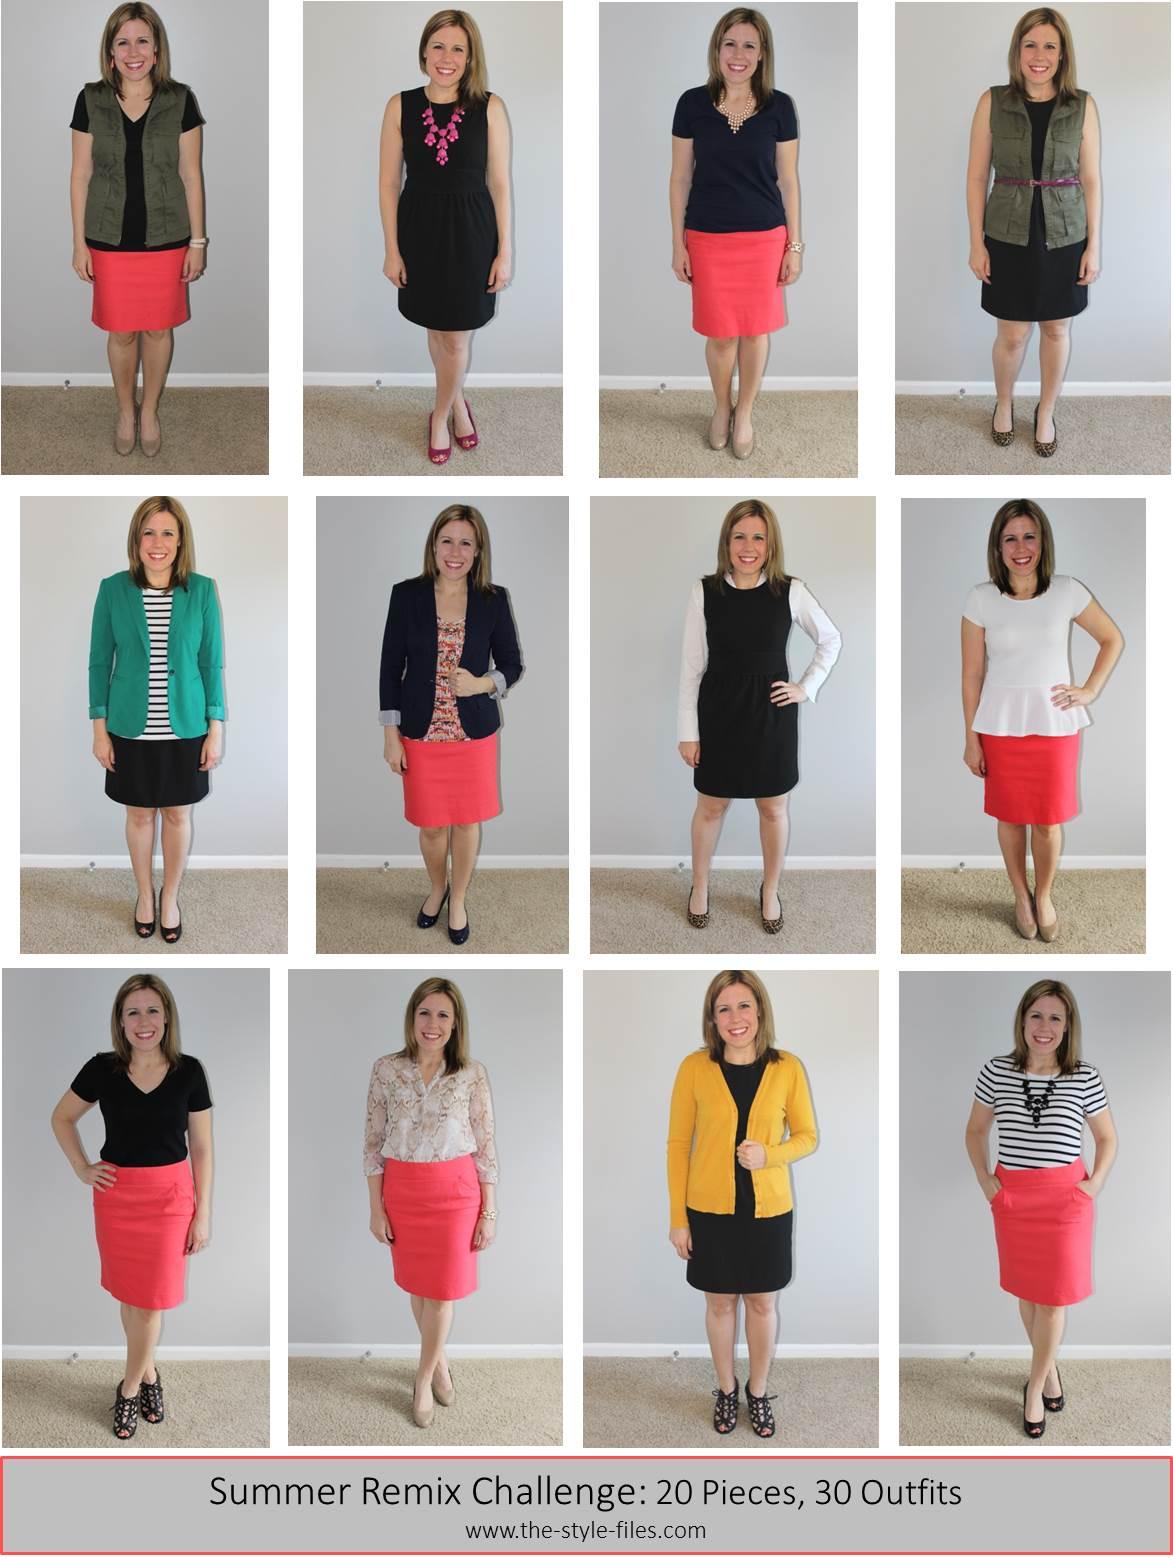 Week 3- 20x30 summer remix with coral pencil skirt, black dress